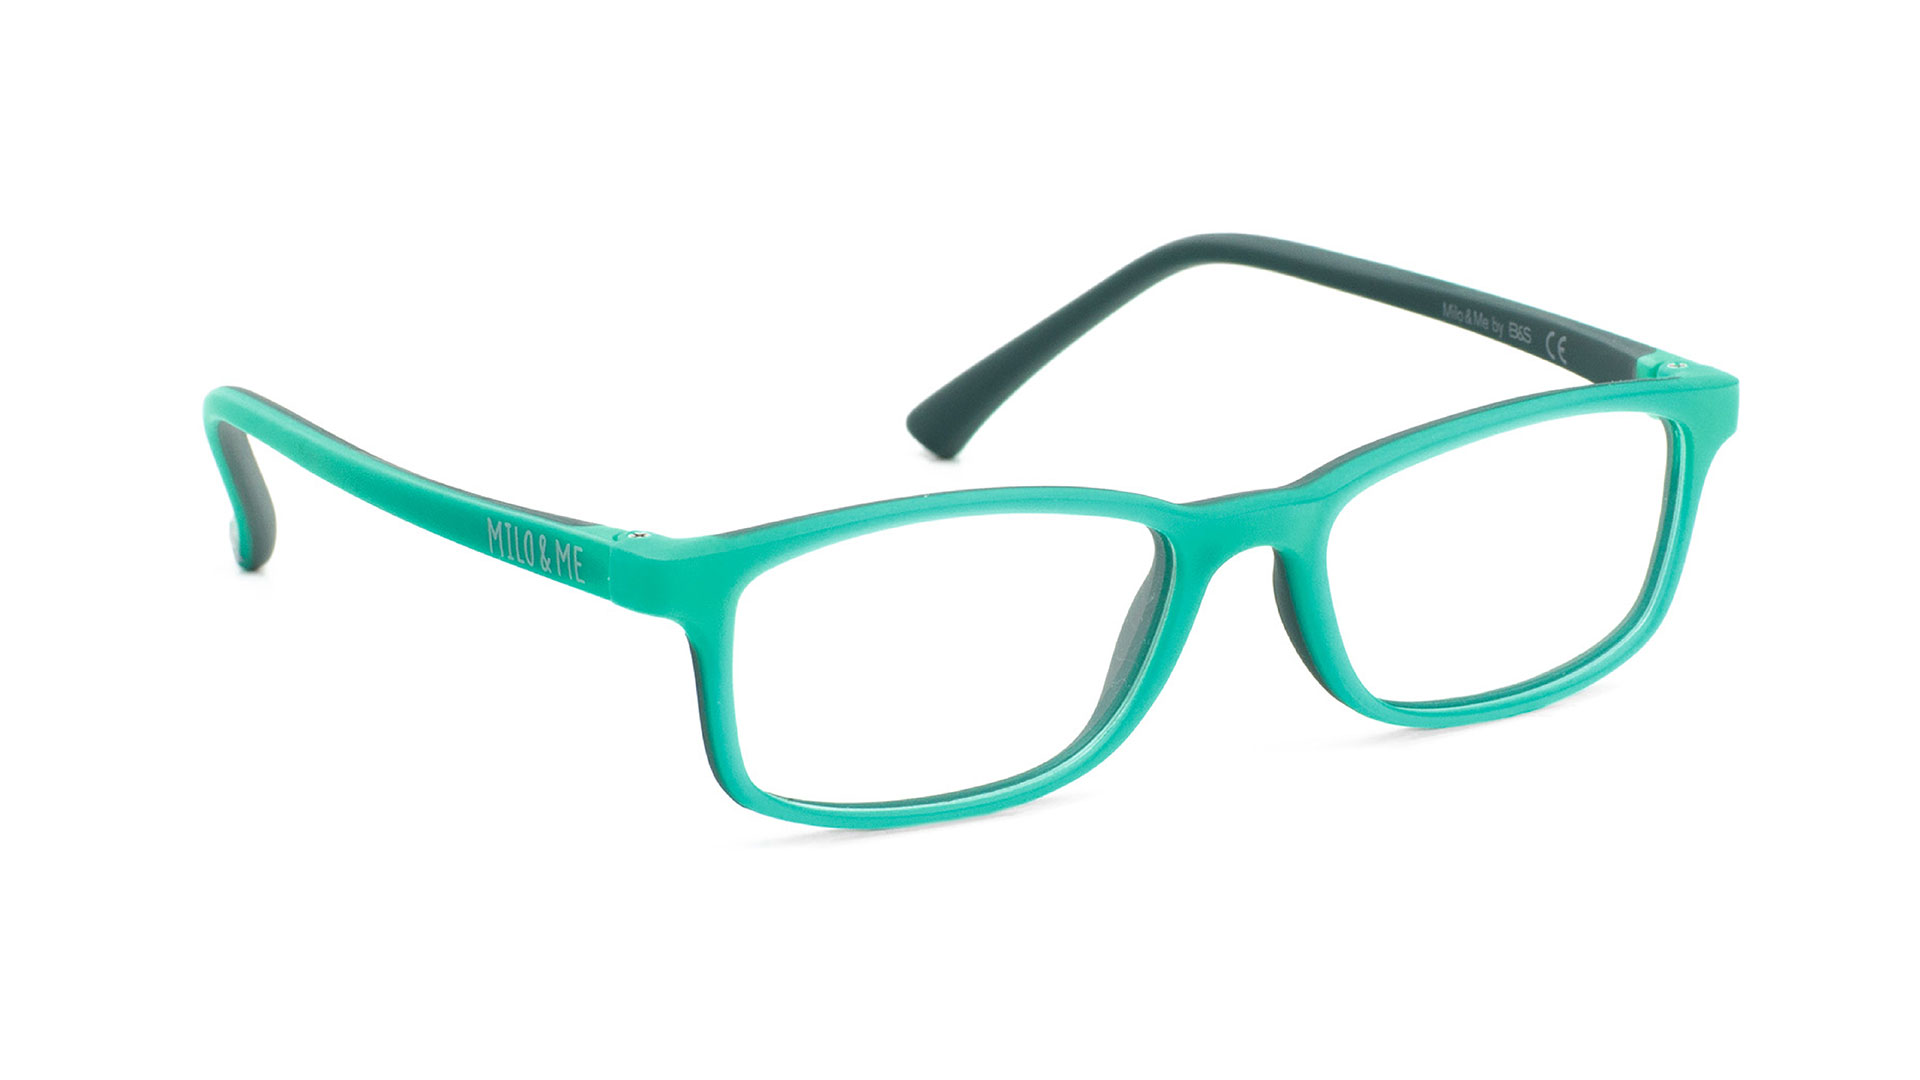 Light Green Dark Green - Milo & Me Eyewear - Optimum RX Lens Specialists